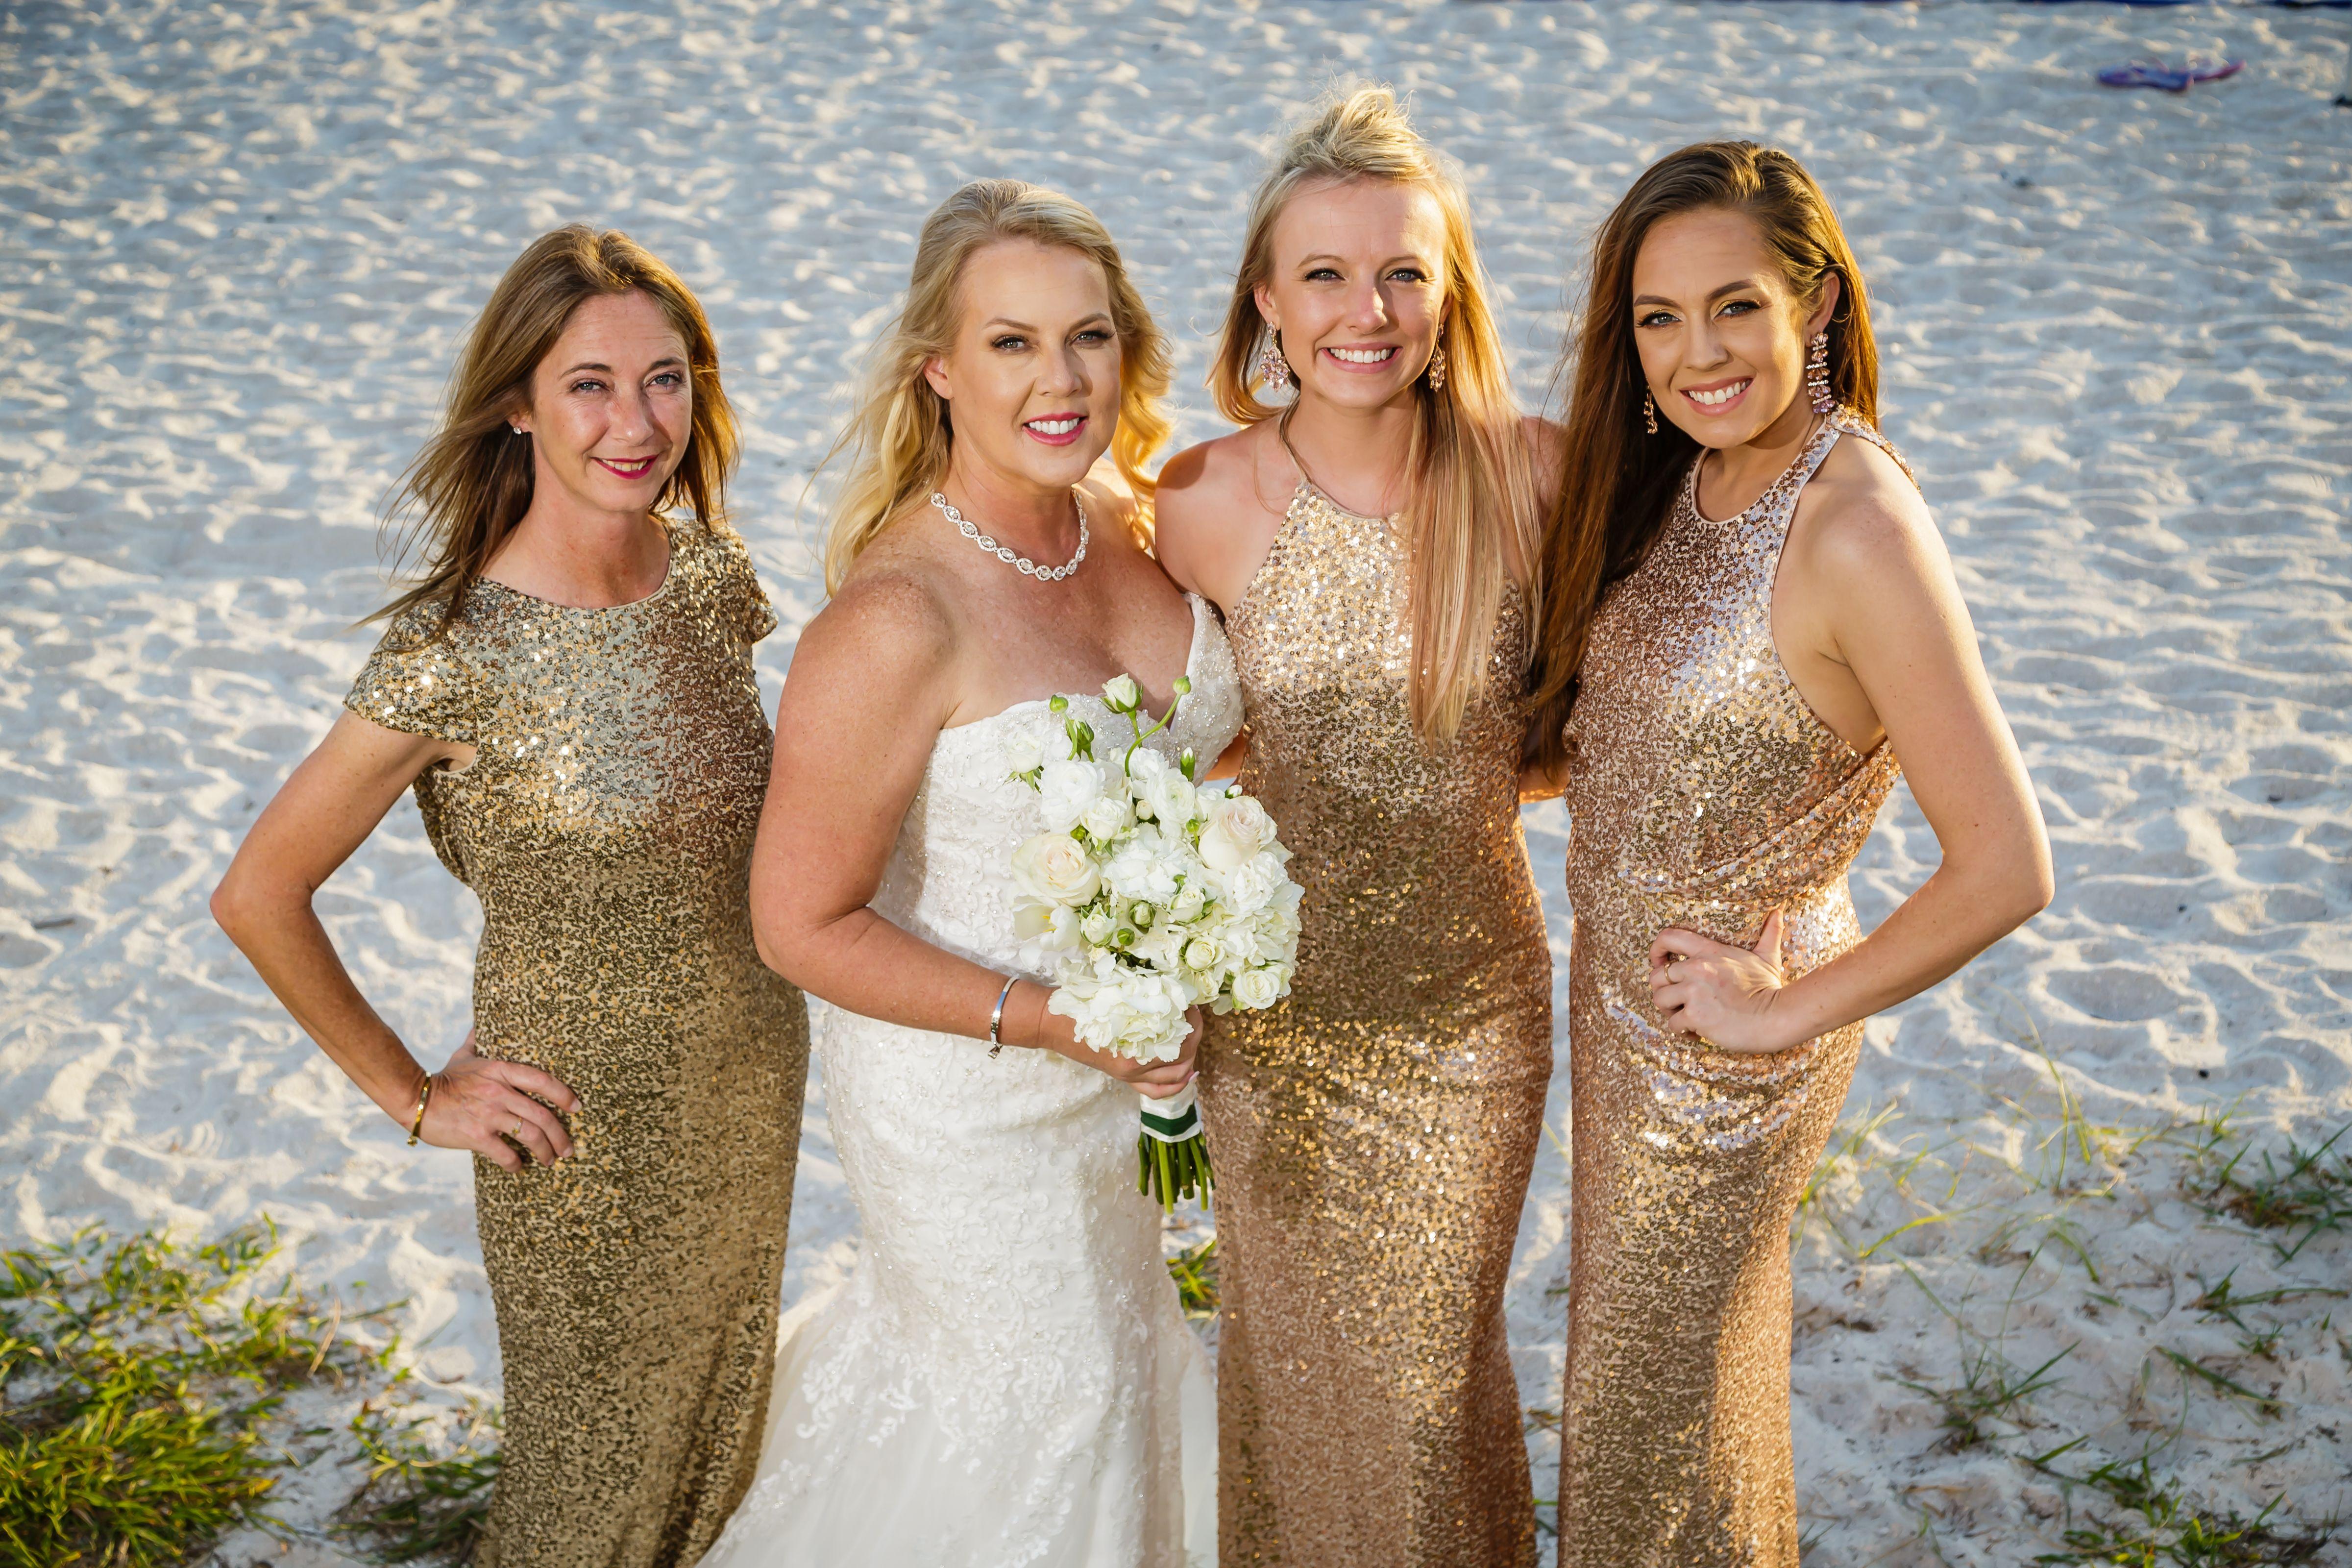 Beach wedding party dresses  Photographers St Pete Beach Weddings Grand Plaza Don CeSar Sirata